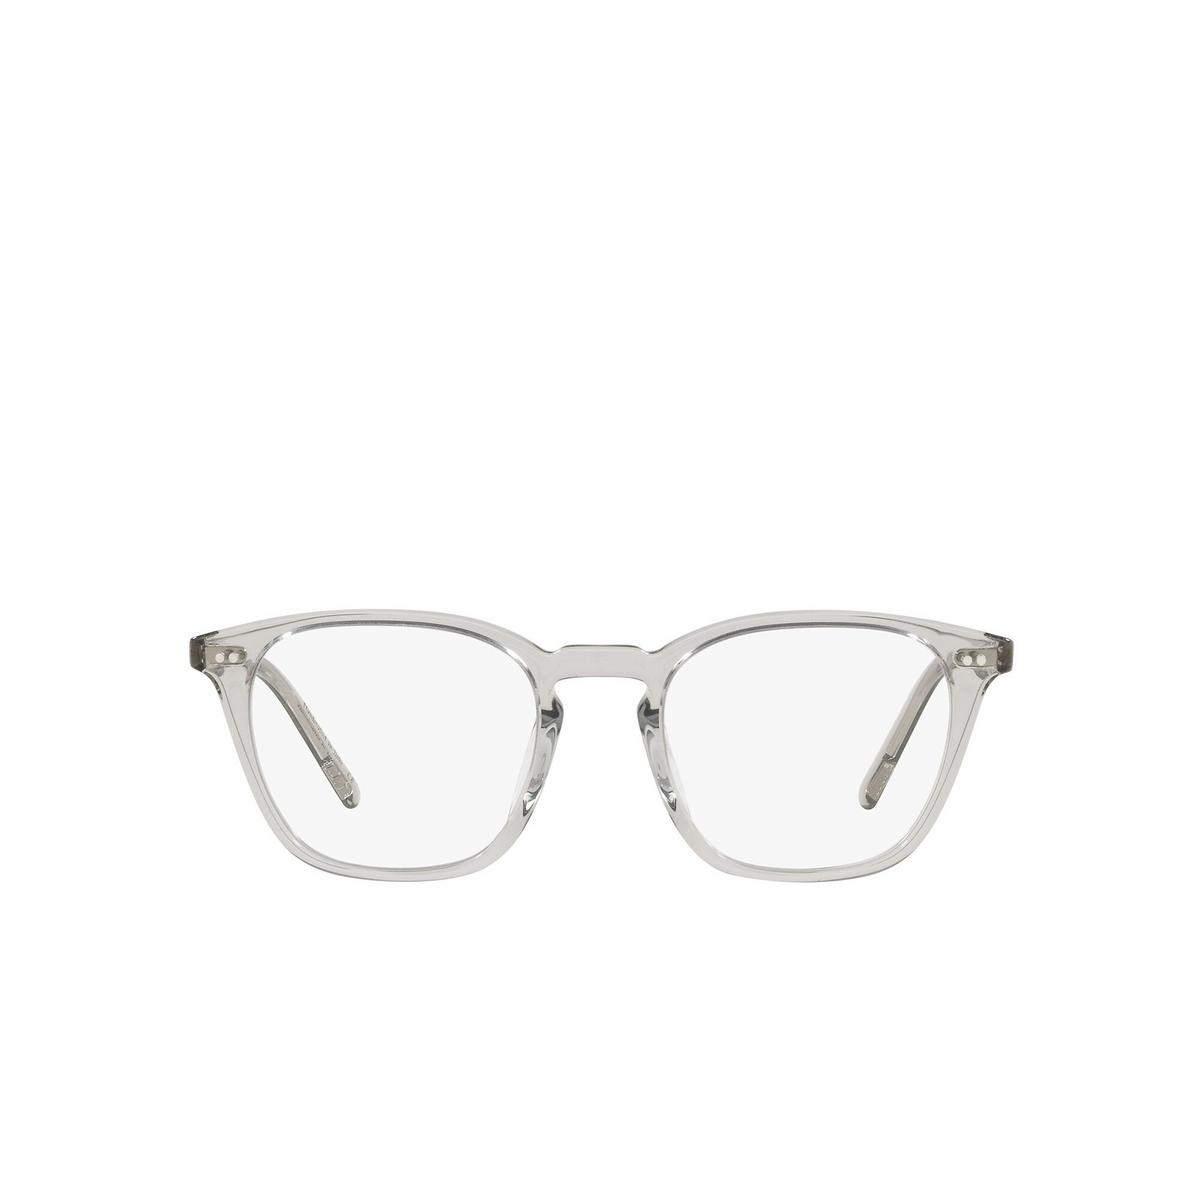 Oliver Peoples® Square Sunglasses: Frère Ny OV5462SU color Black Diamond 1669SB - front view.